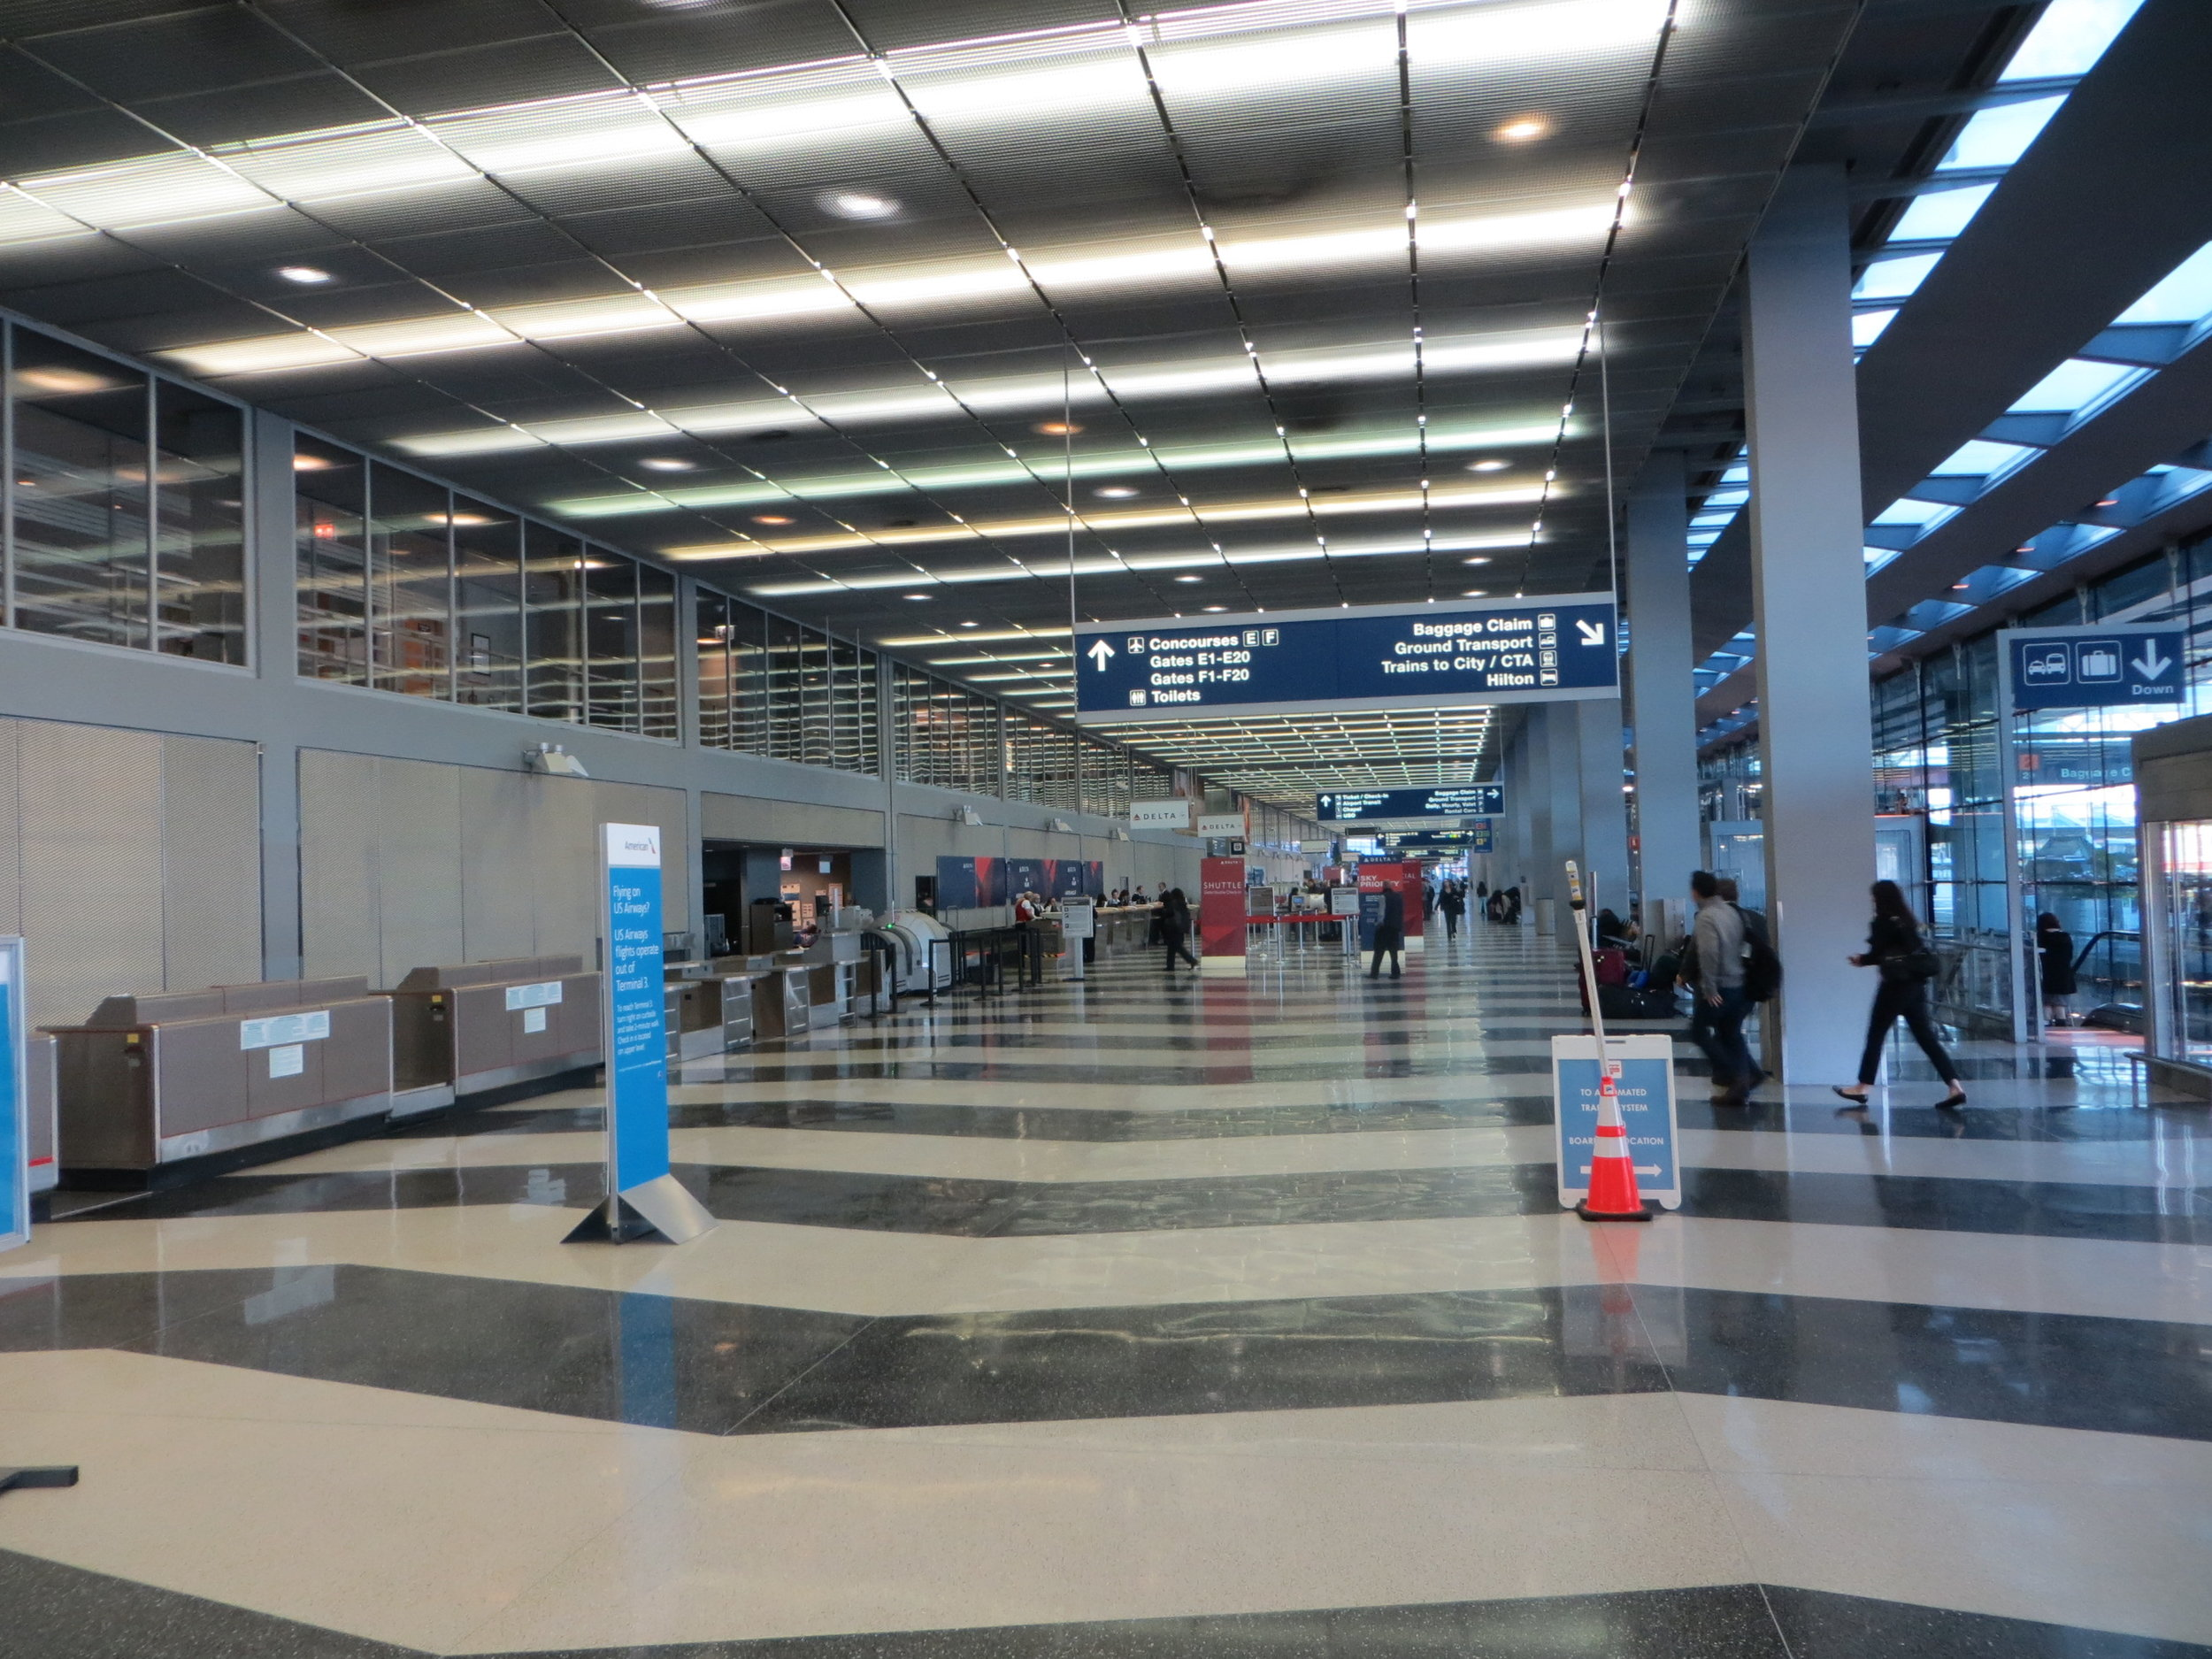 20141007_04_O'Hare_Airport.jpg